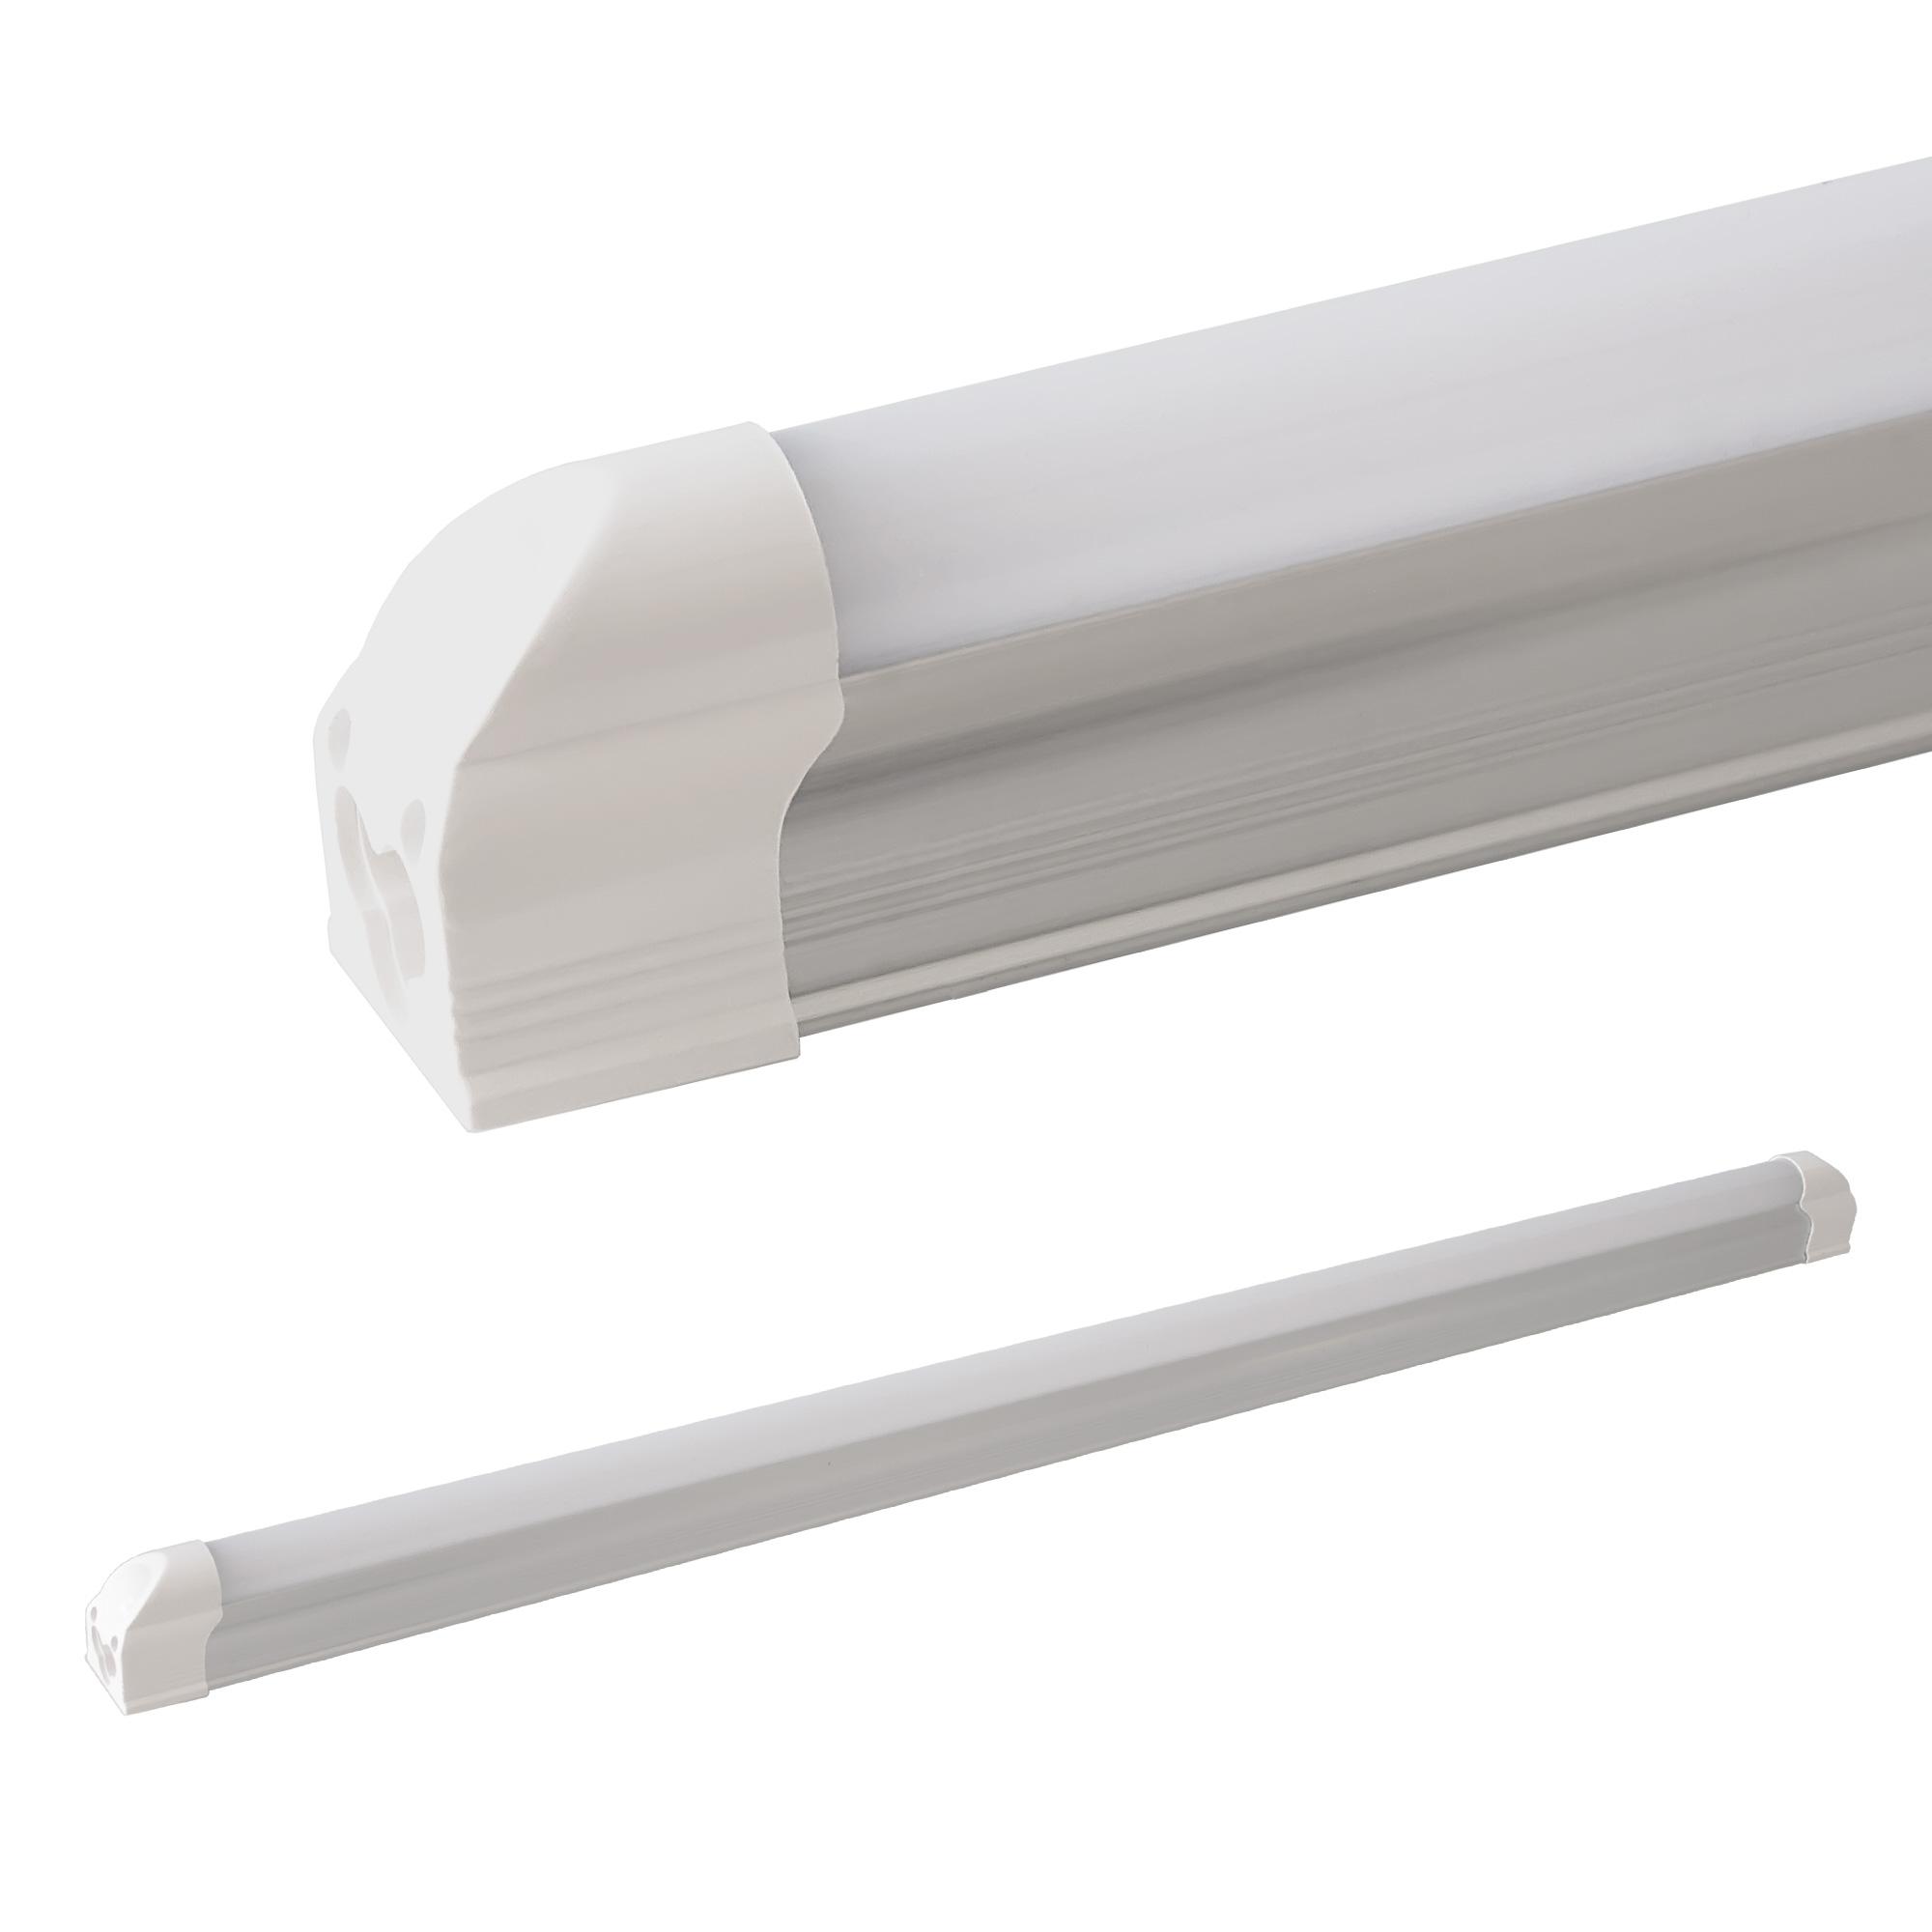 ledvero t5 led lichtleiste 120cm abdeckung milchig neutralwei r hre tube. Black Bedroom Furniture Sets. Home Design Ideas